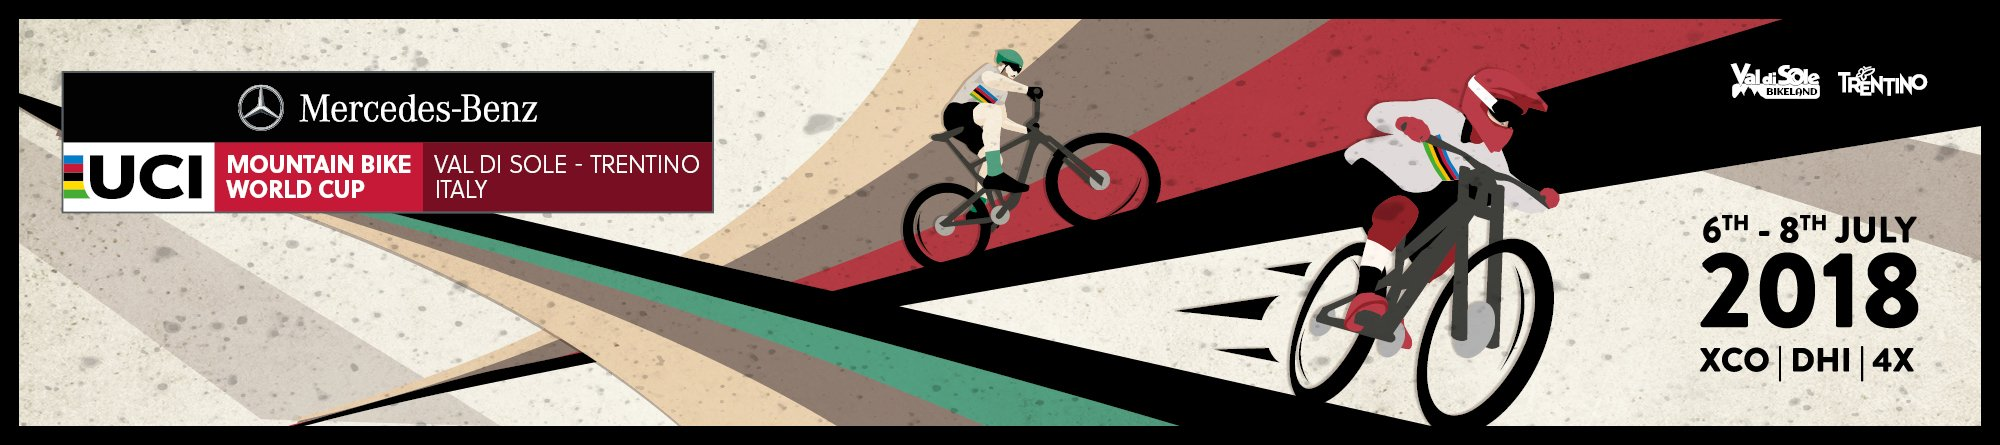 XCCXCC Race - UCI MTB WORLD CUP 2018